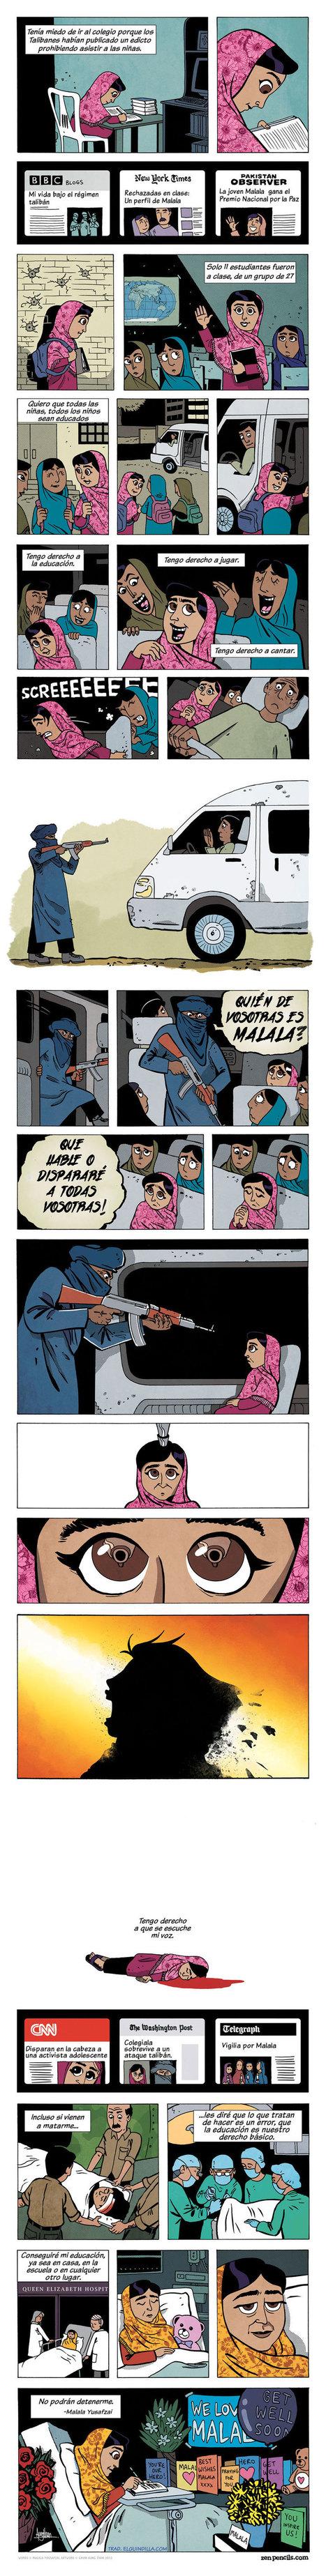 Cómic sobre Malala Yousafzai en castellano. | Bibliotecas Escolares do S. XXI | Scoop.it